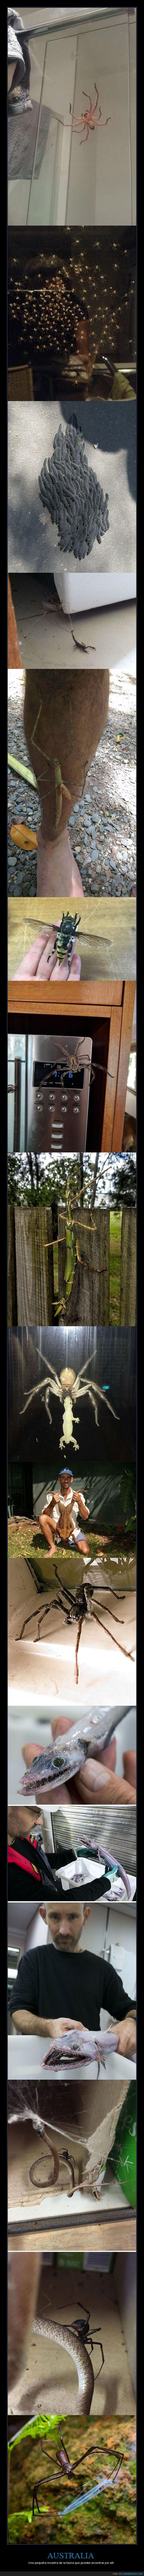 animales,australia,bichos